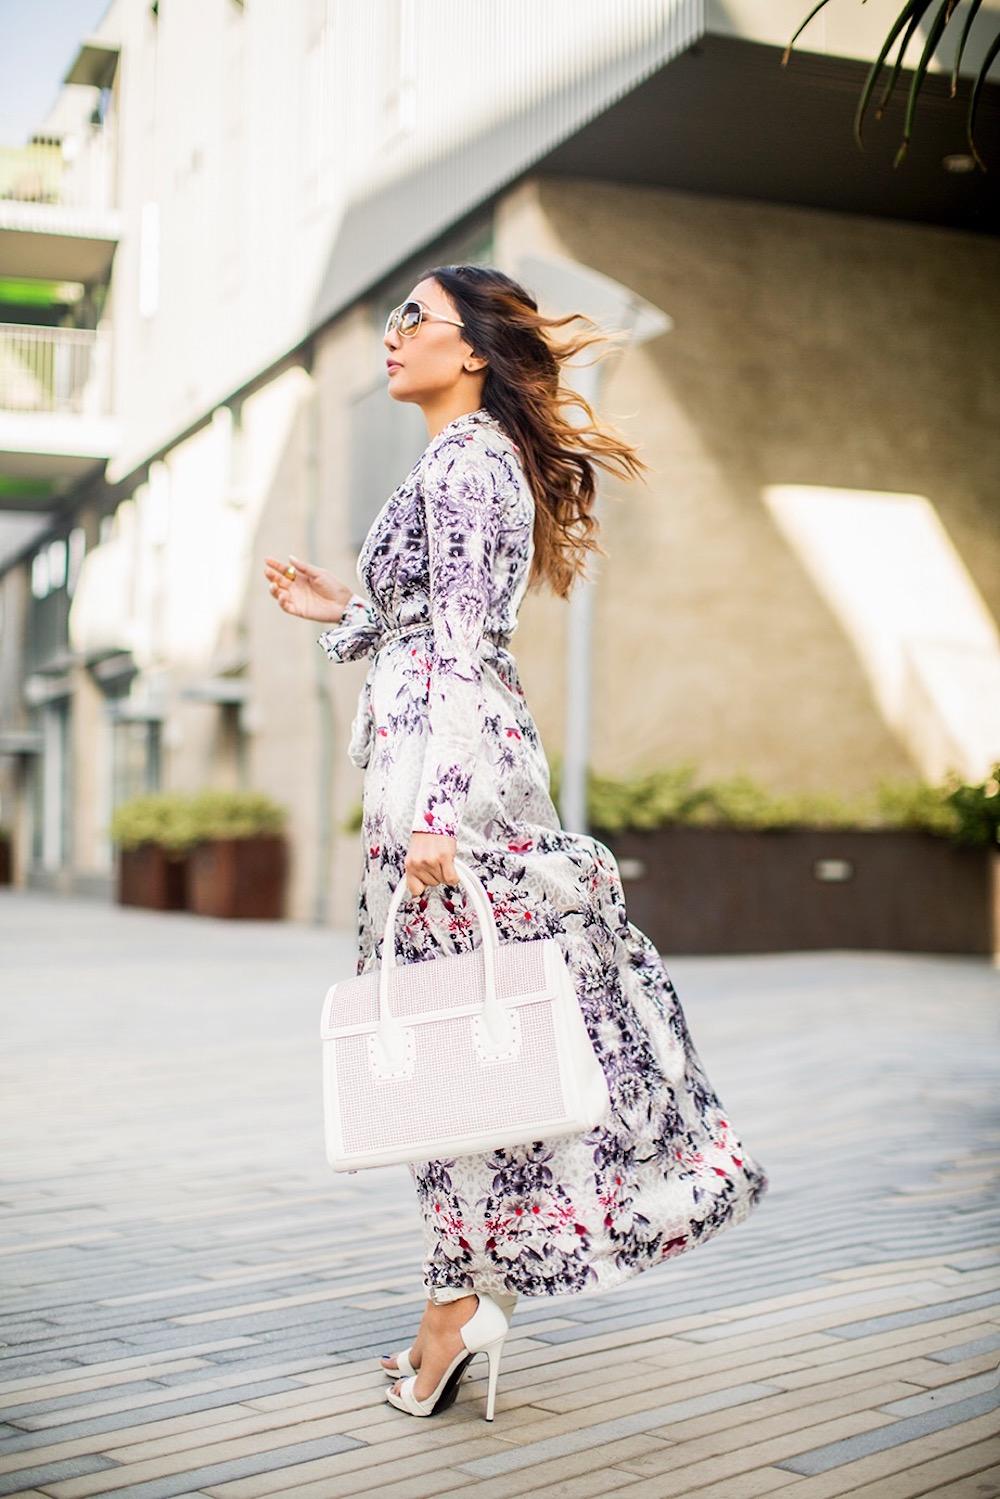 fashionable lady in maxidress